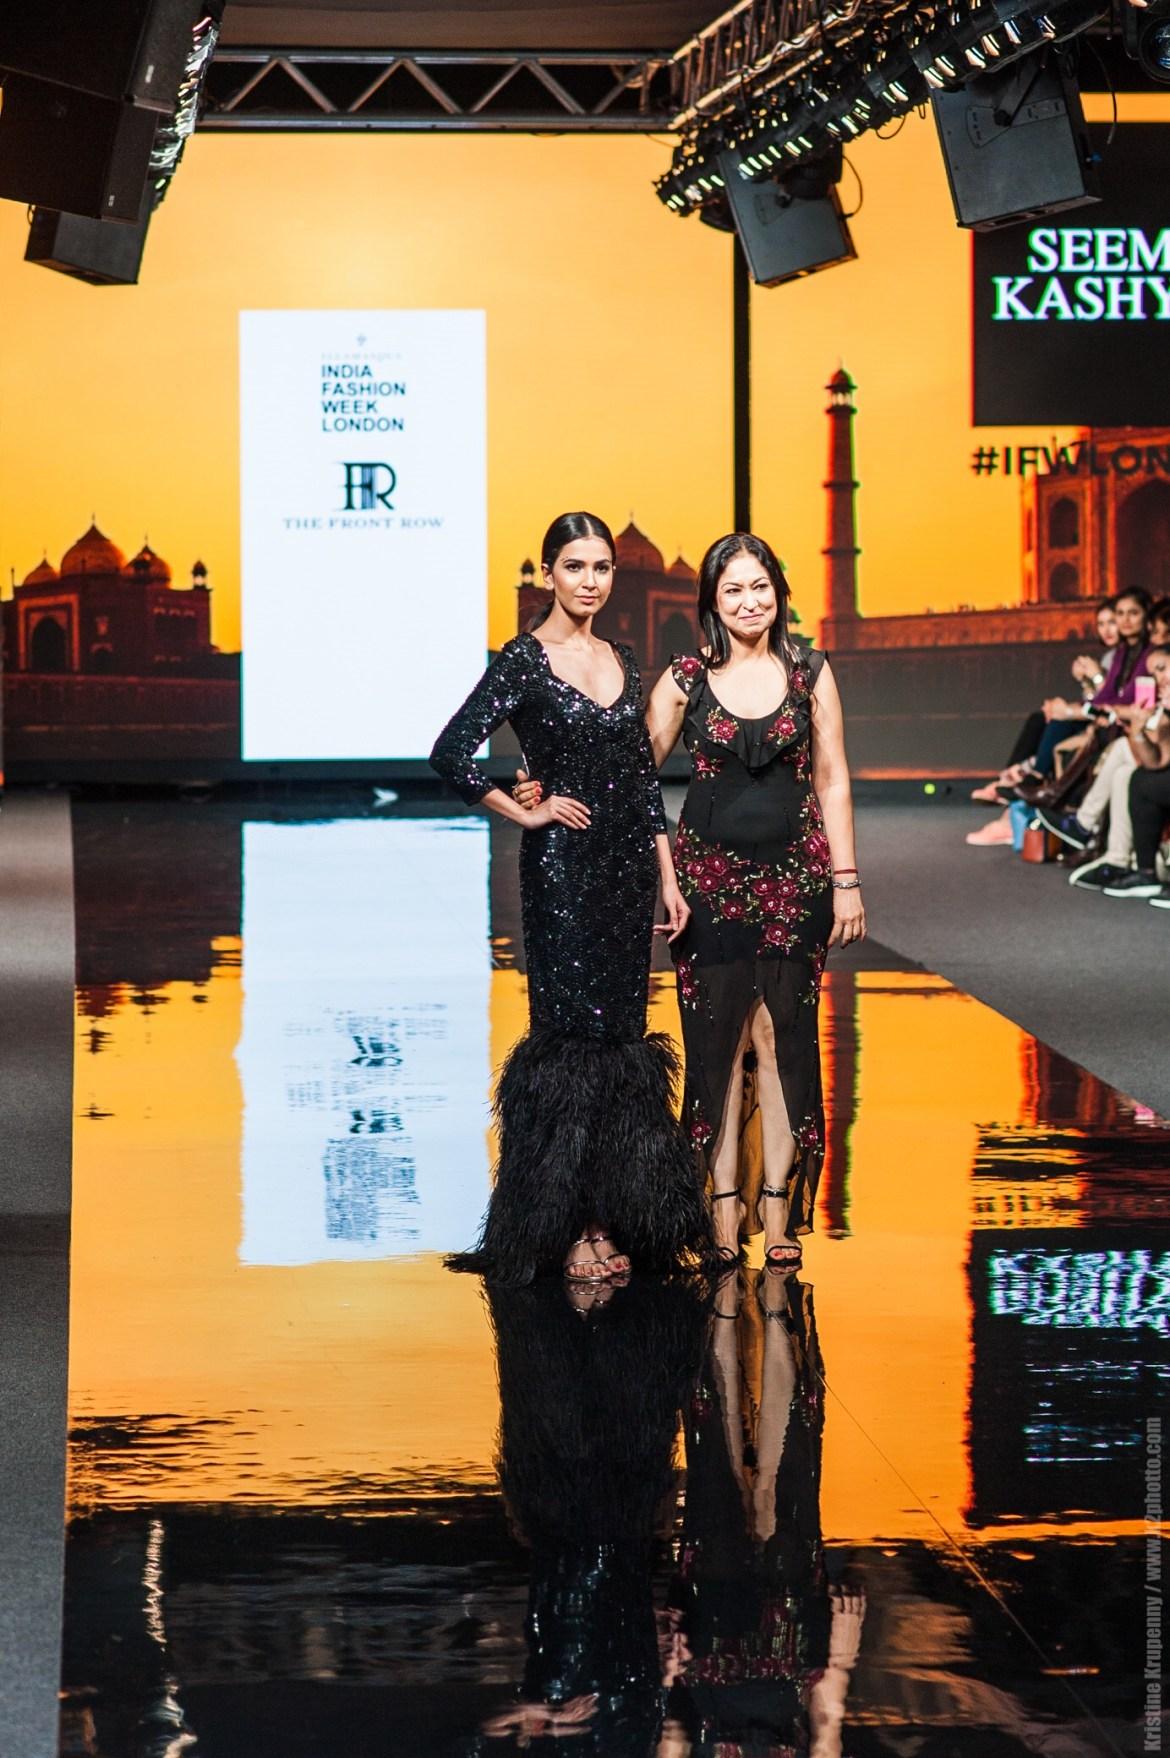 MIss India Elite Bhavyata Sharma With Designer Seema Kashyap (1)